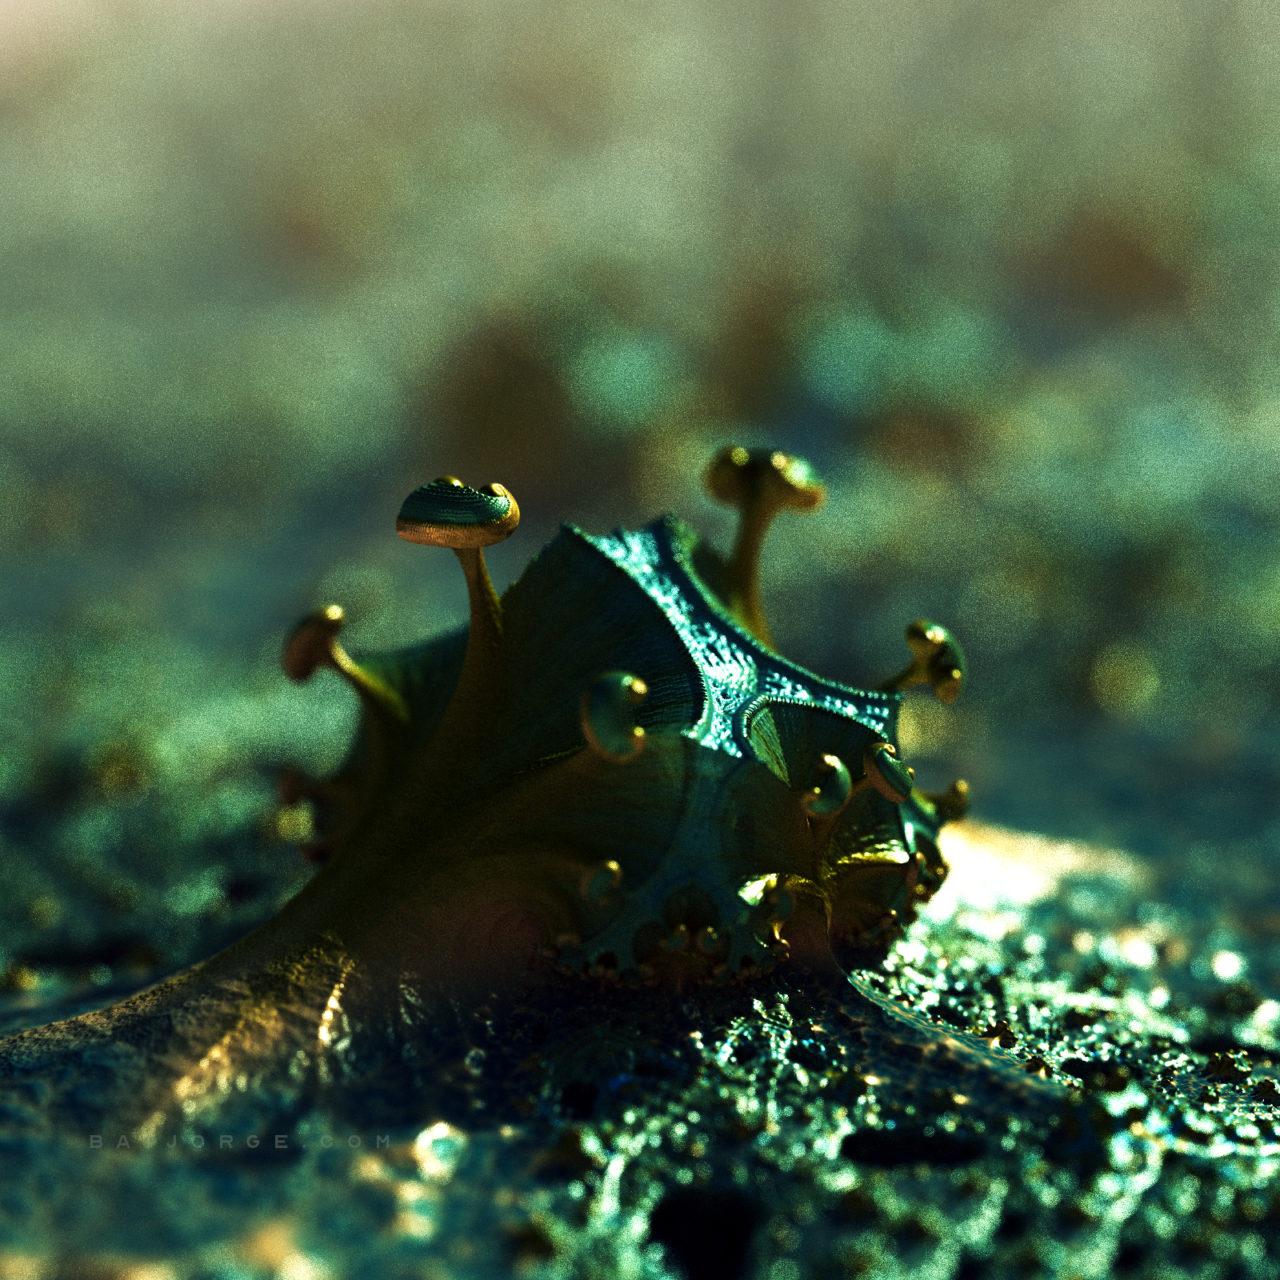 3d fractal.organic look. depth of field. mushroom alien plant